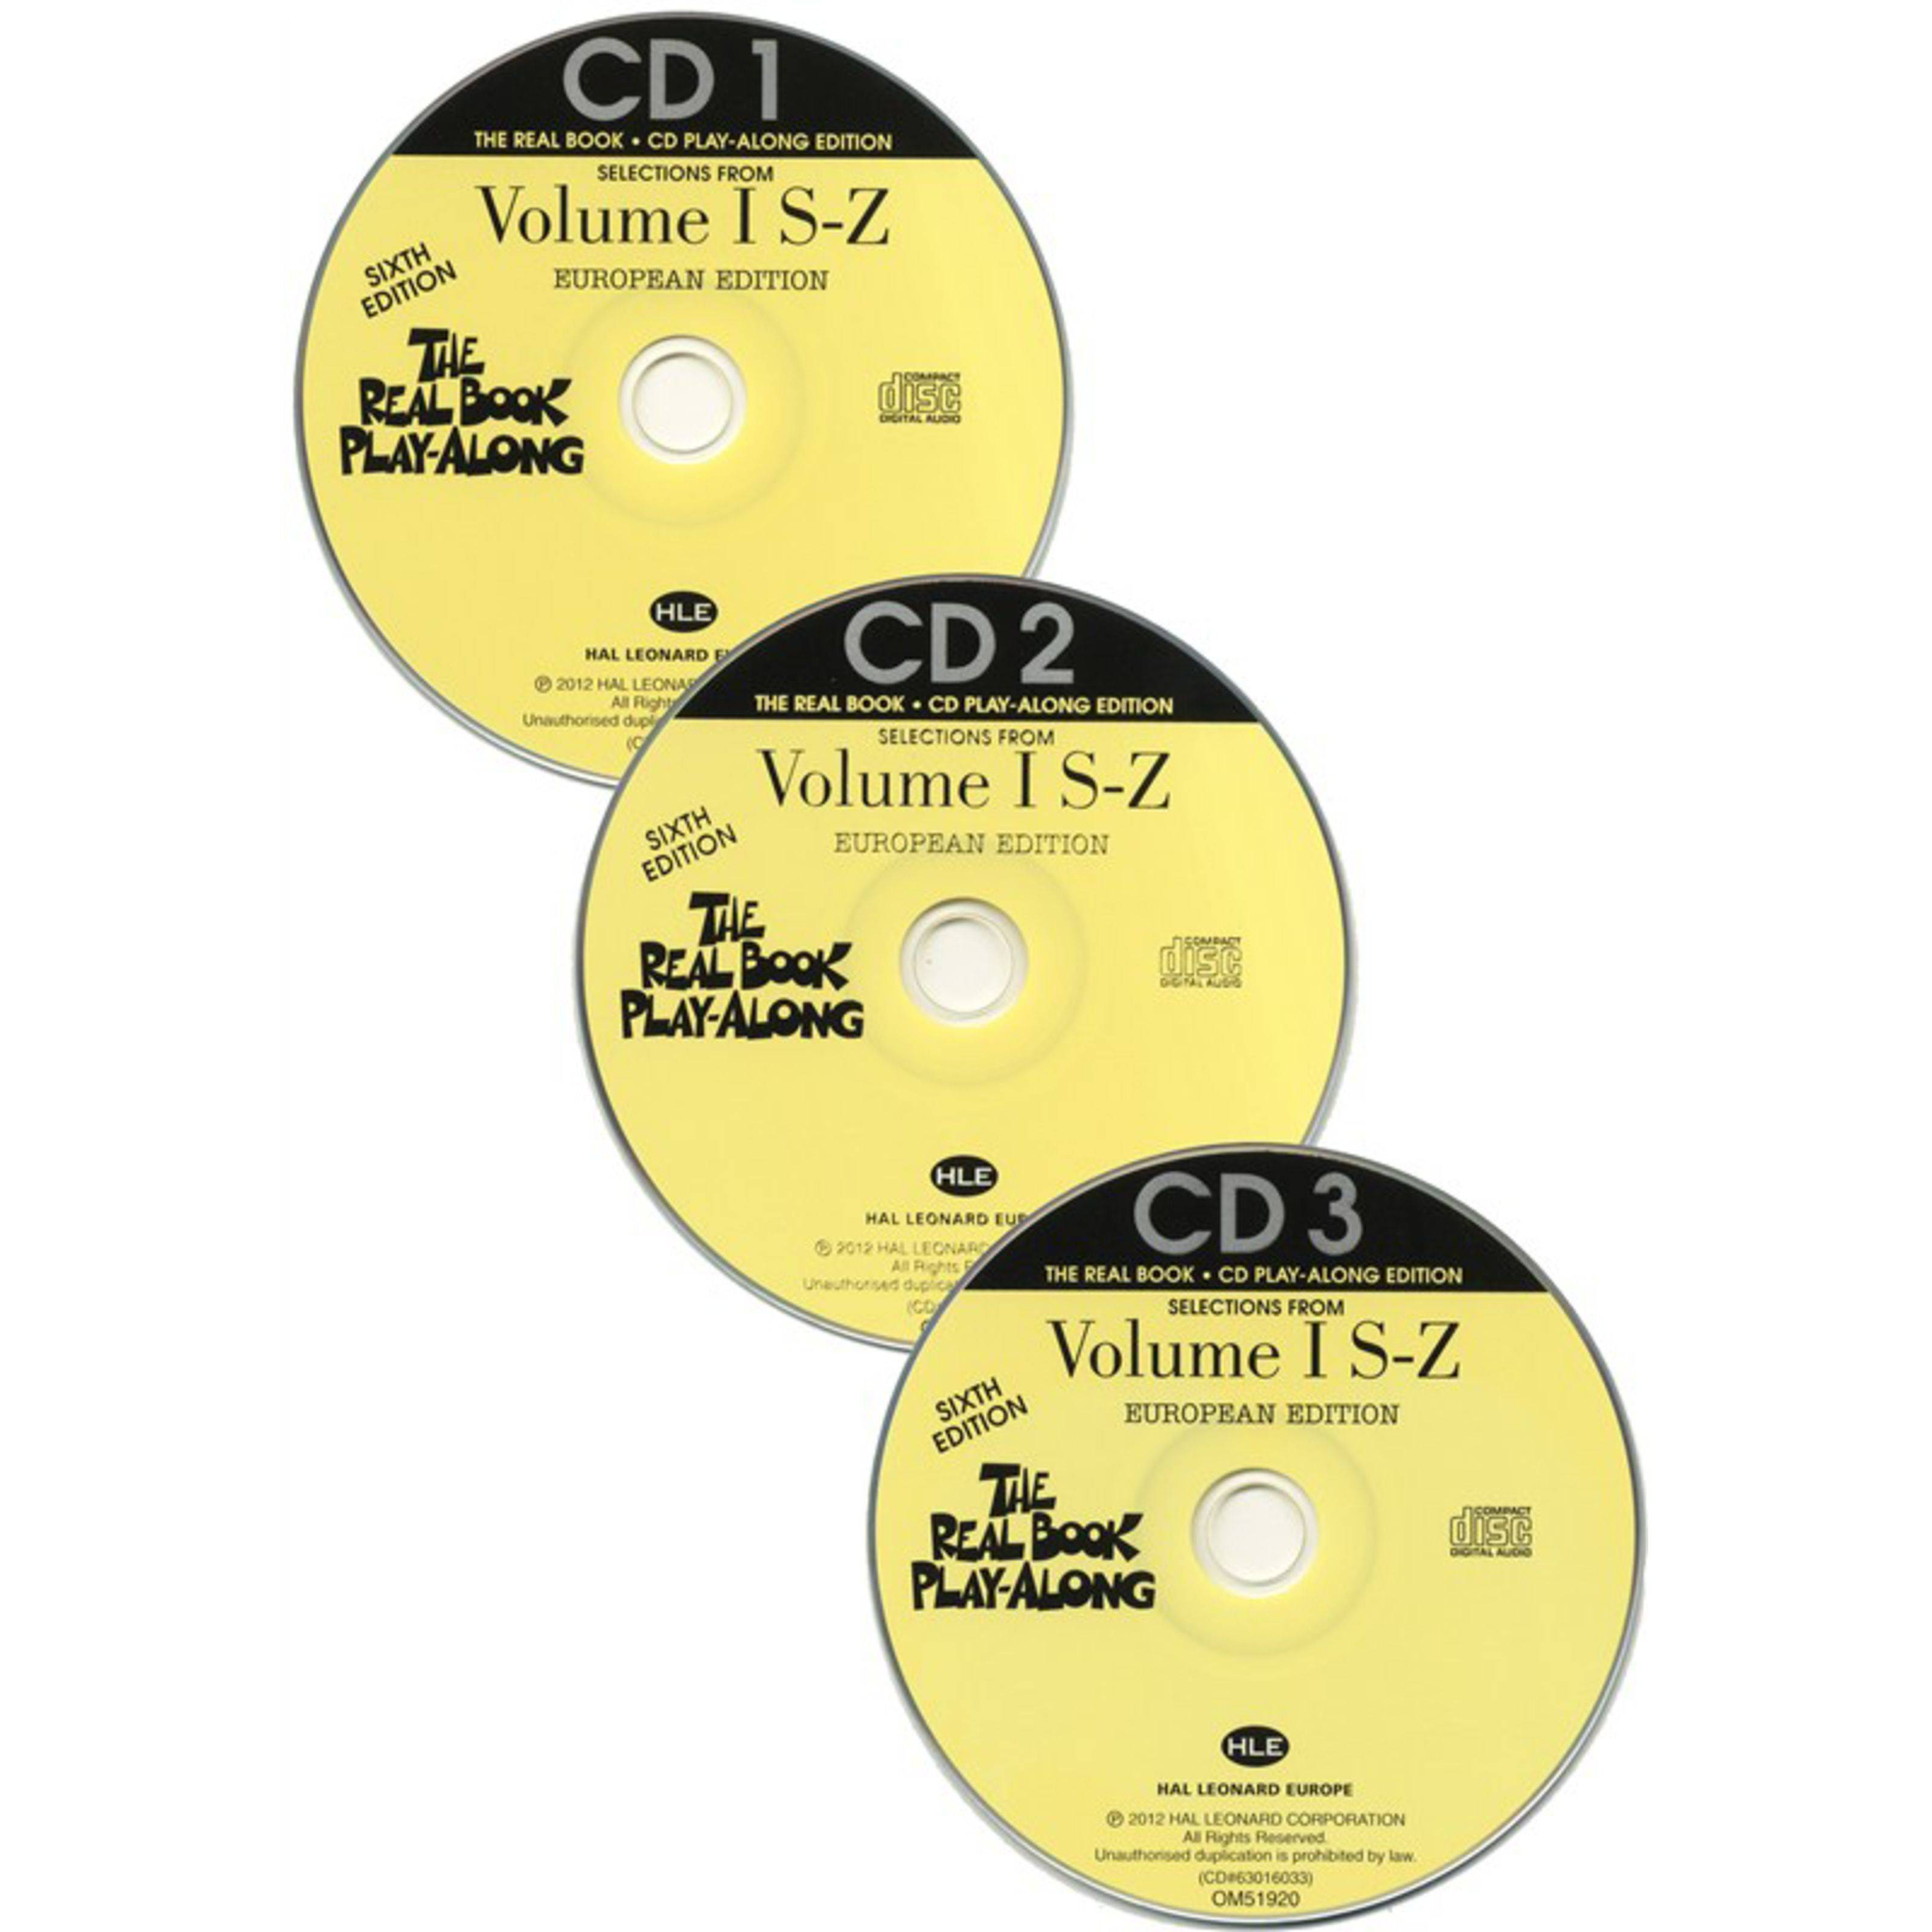 Hal Leonard The Real Book Playalong S-Z Sixth Edition - Vol.1, 3 CDs